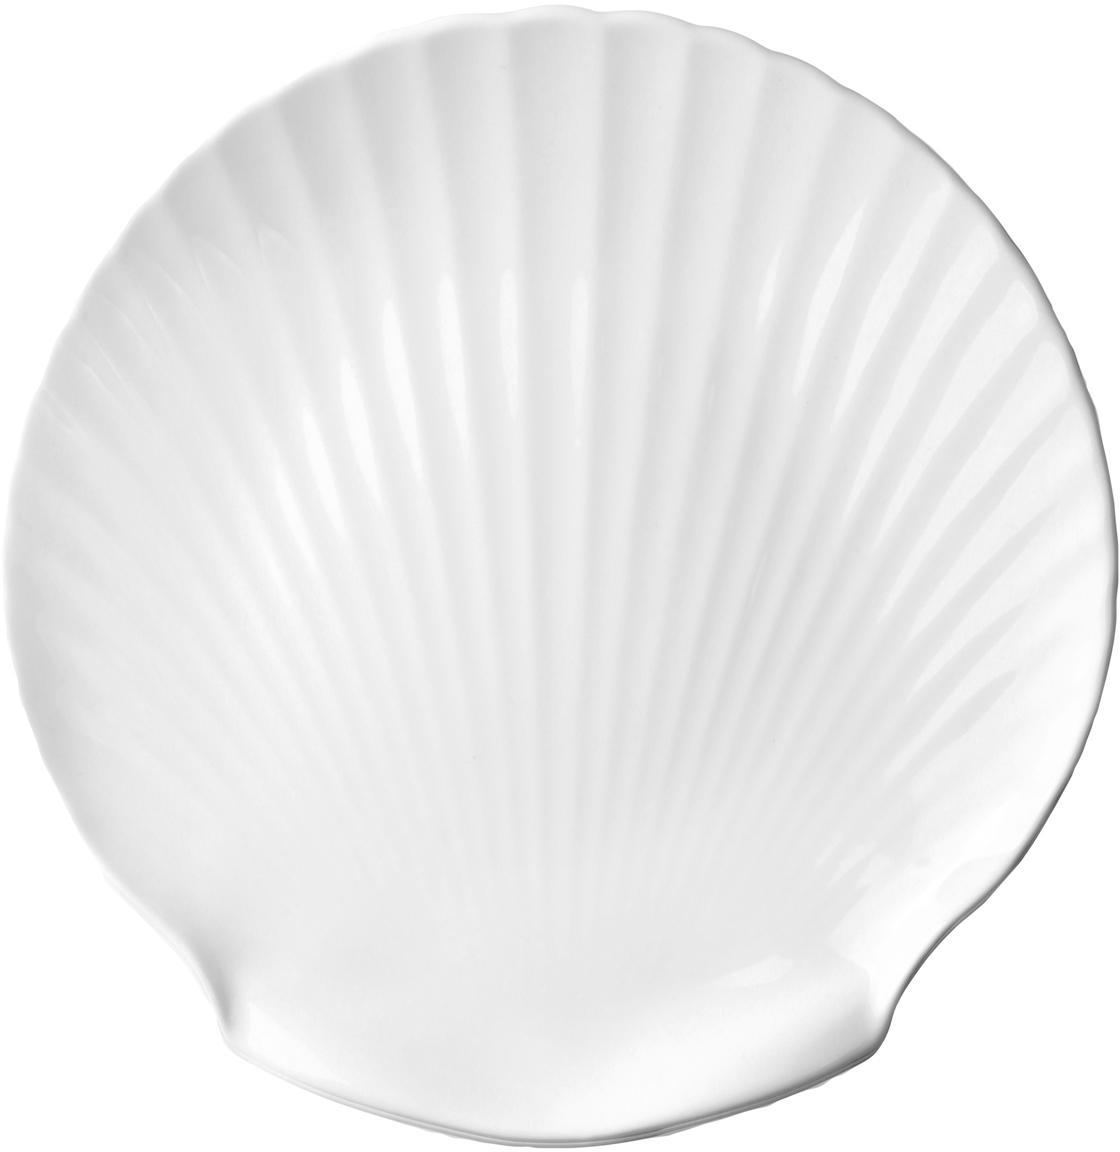 Fine Bone China serveerplateau Shell, Beenderporselein, Wit, Ø 27 cm